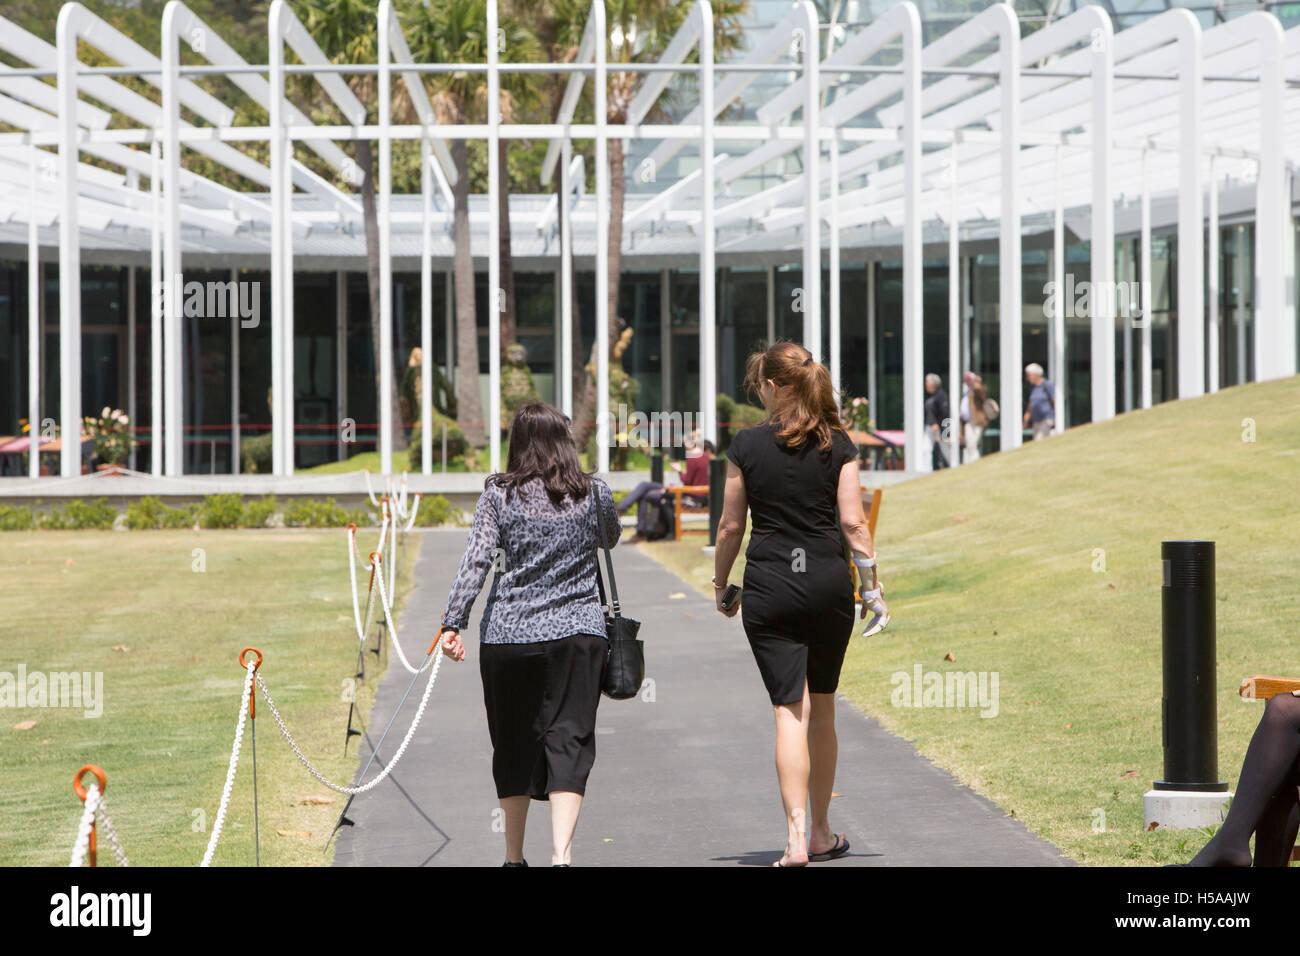 Calyx exhibition building in Sydney Royal Botanic Garden in the city centre ,Australia - Stock Image